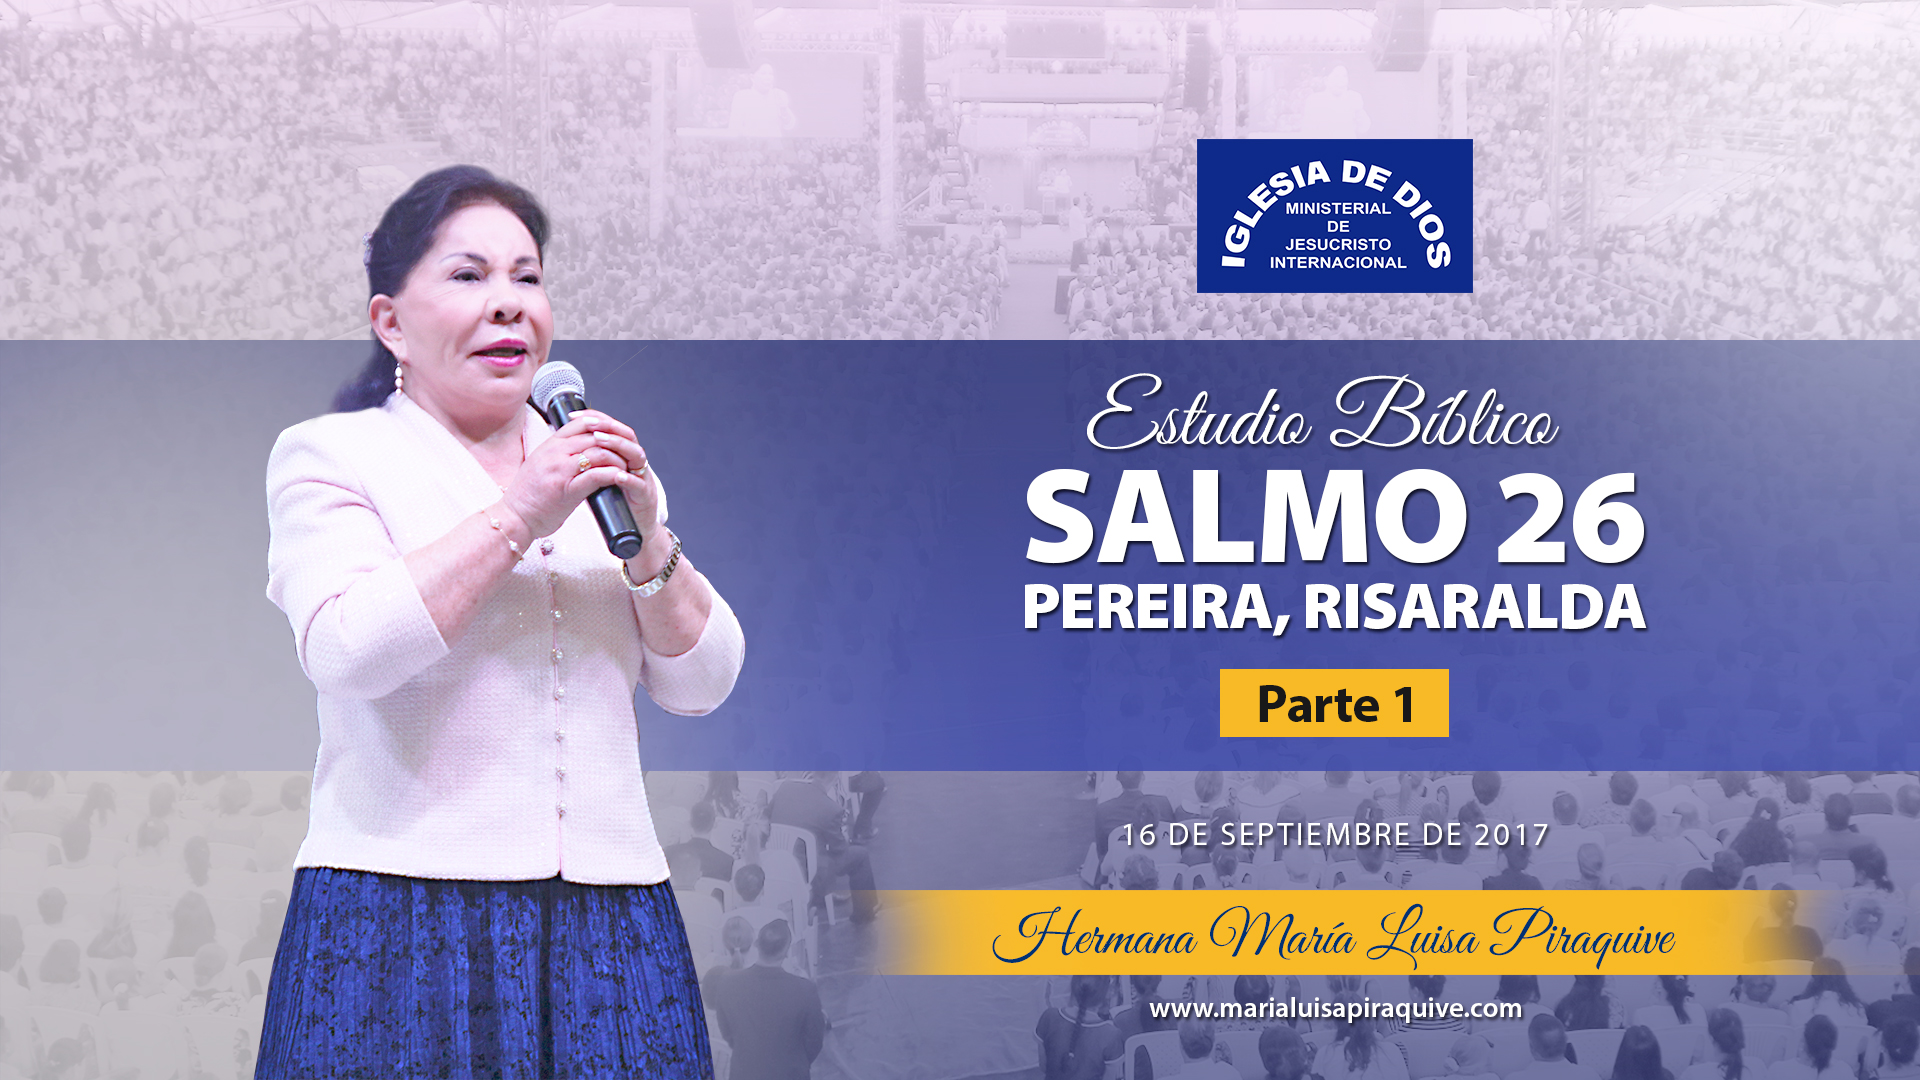 Estudio Bíblico: Salmo 26, Pereira Colombia (Parte 1)